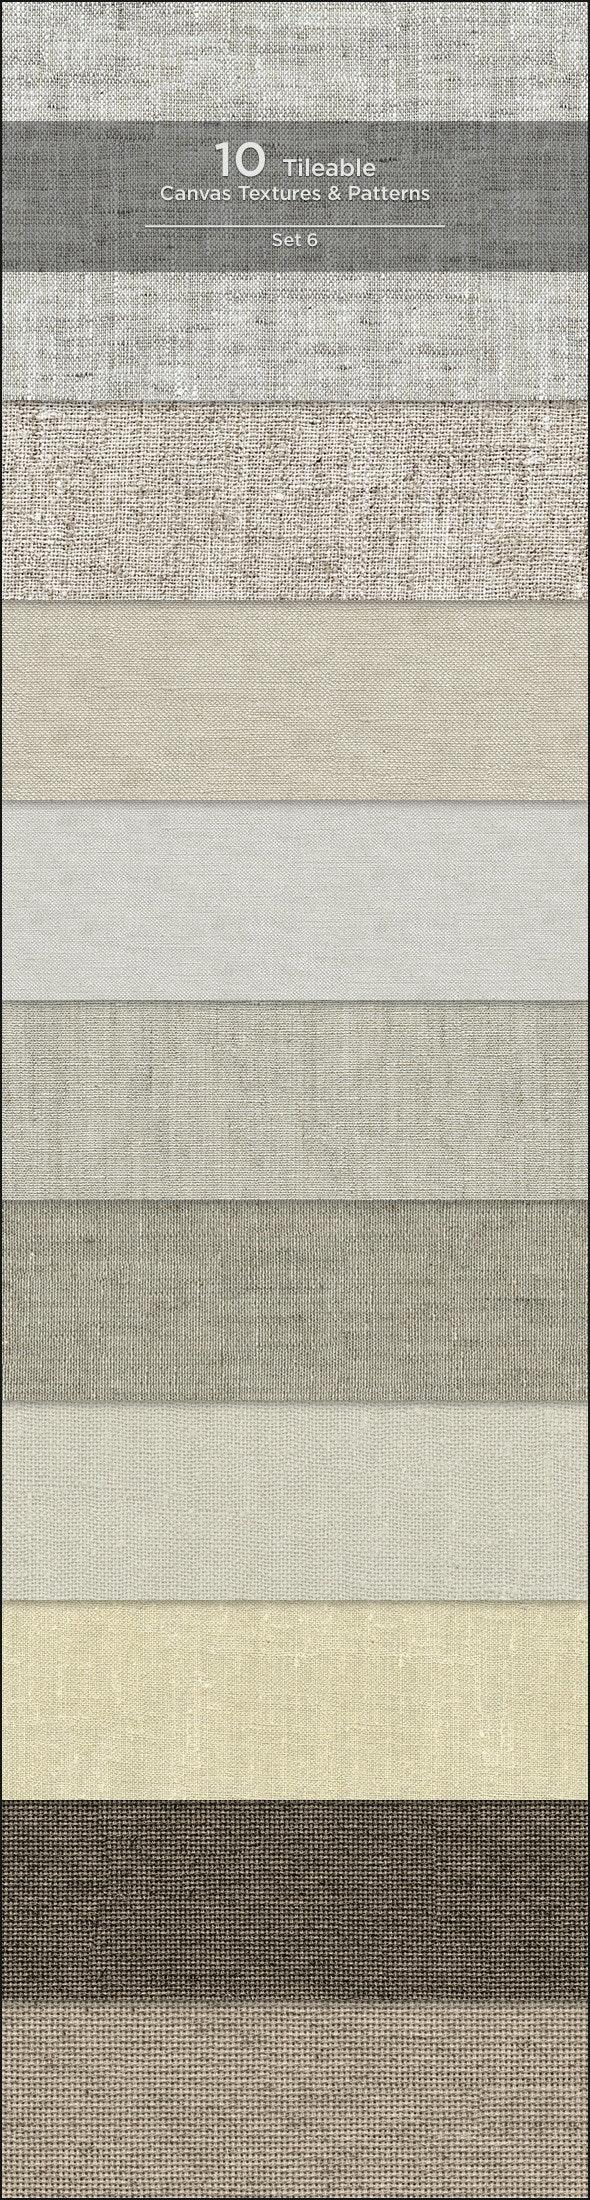 10 Tileable Canvas Textures/Patterns - Miscellaneous Textures / Fills / Patterns